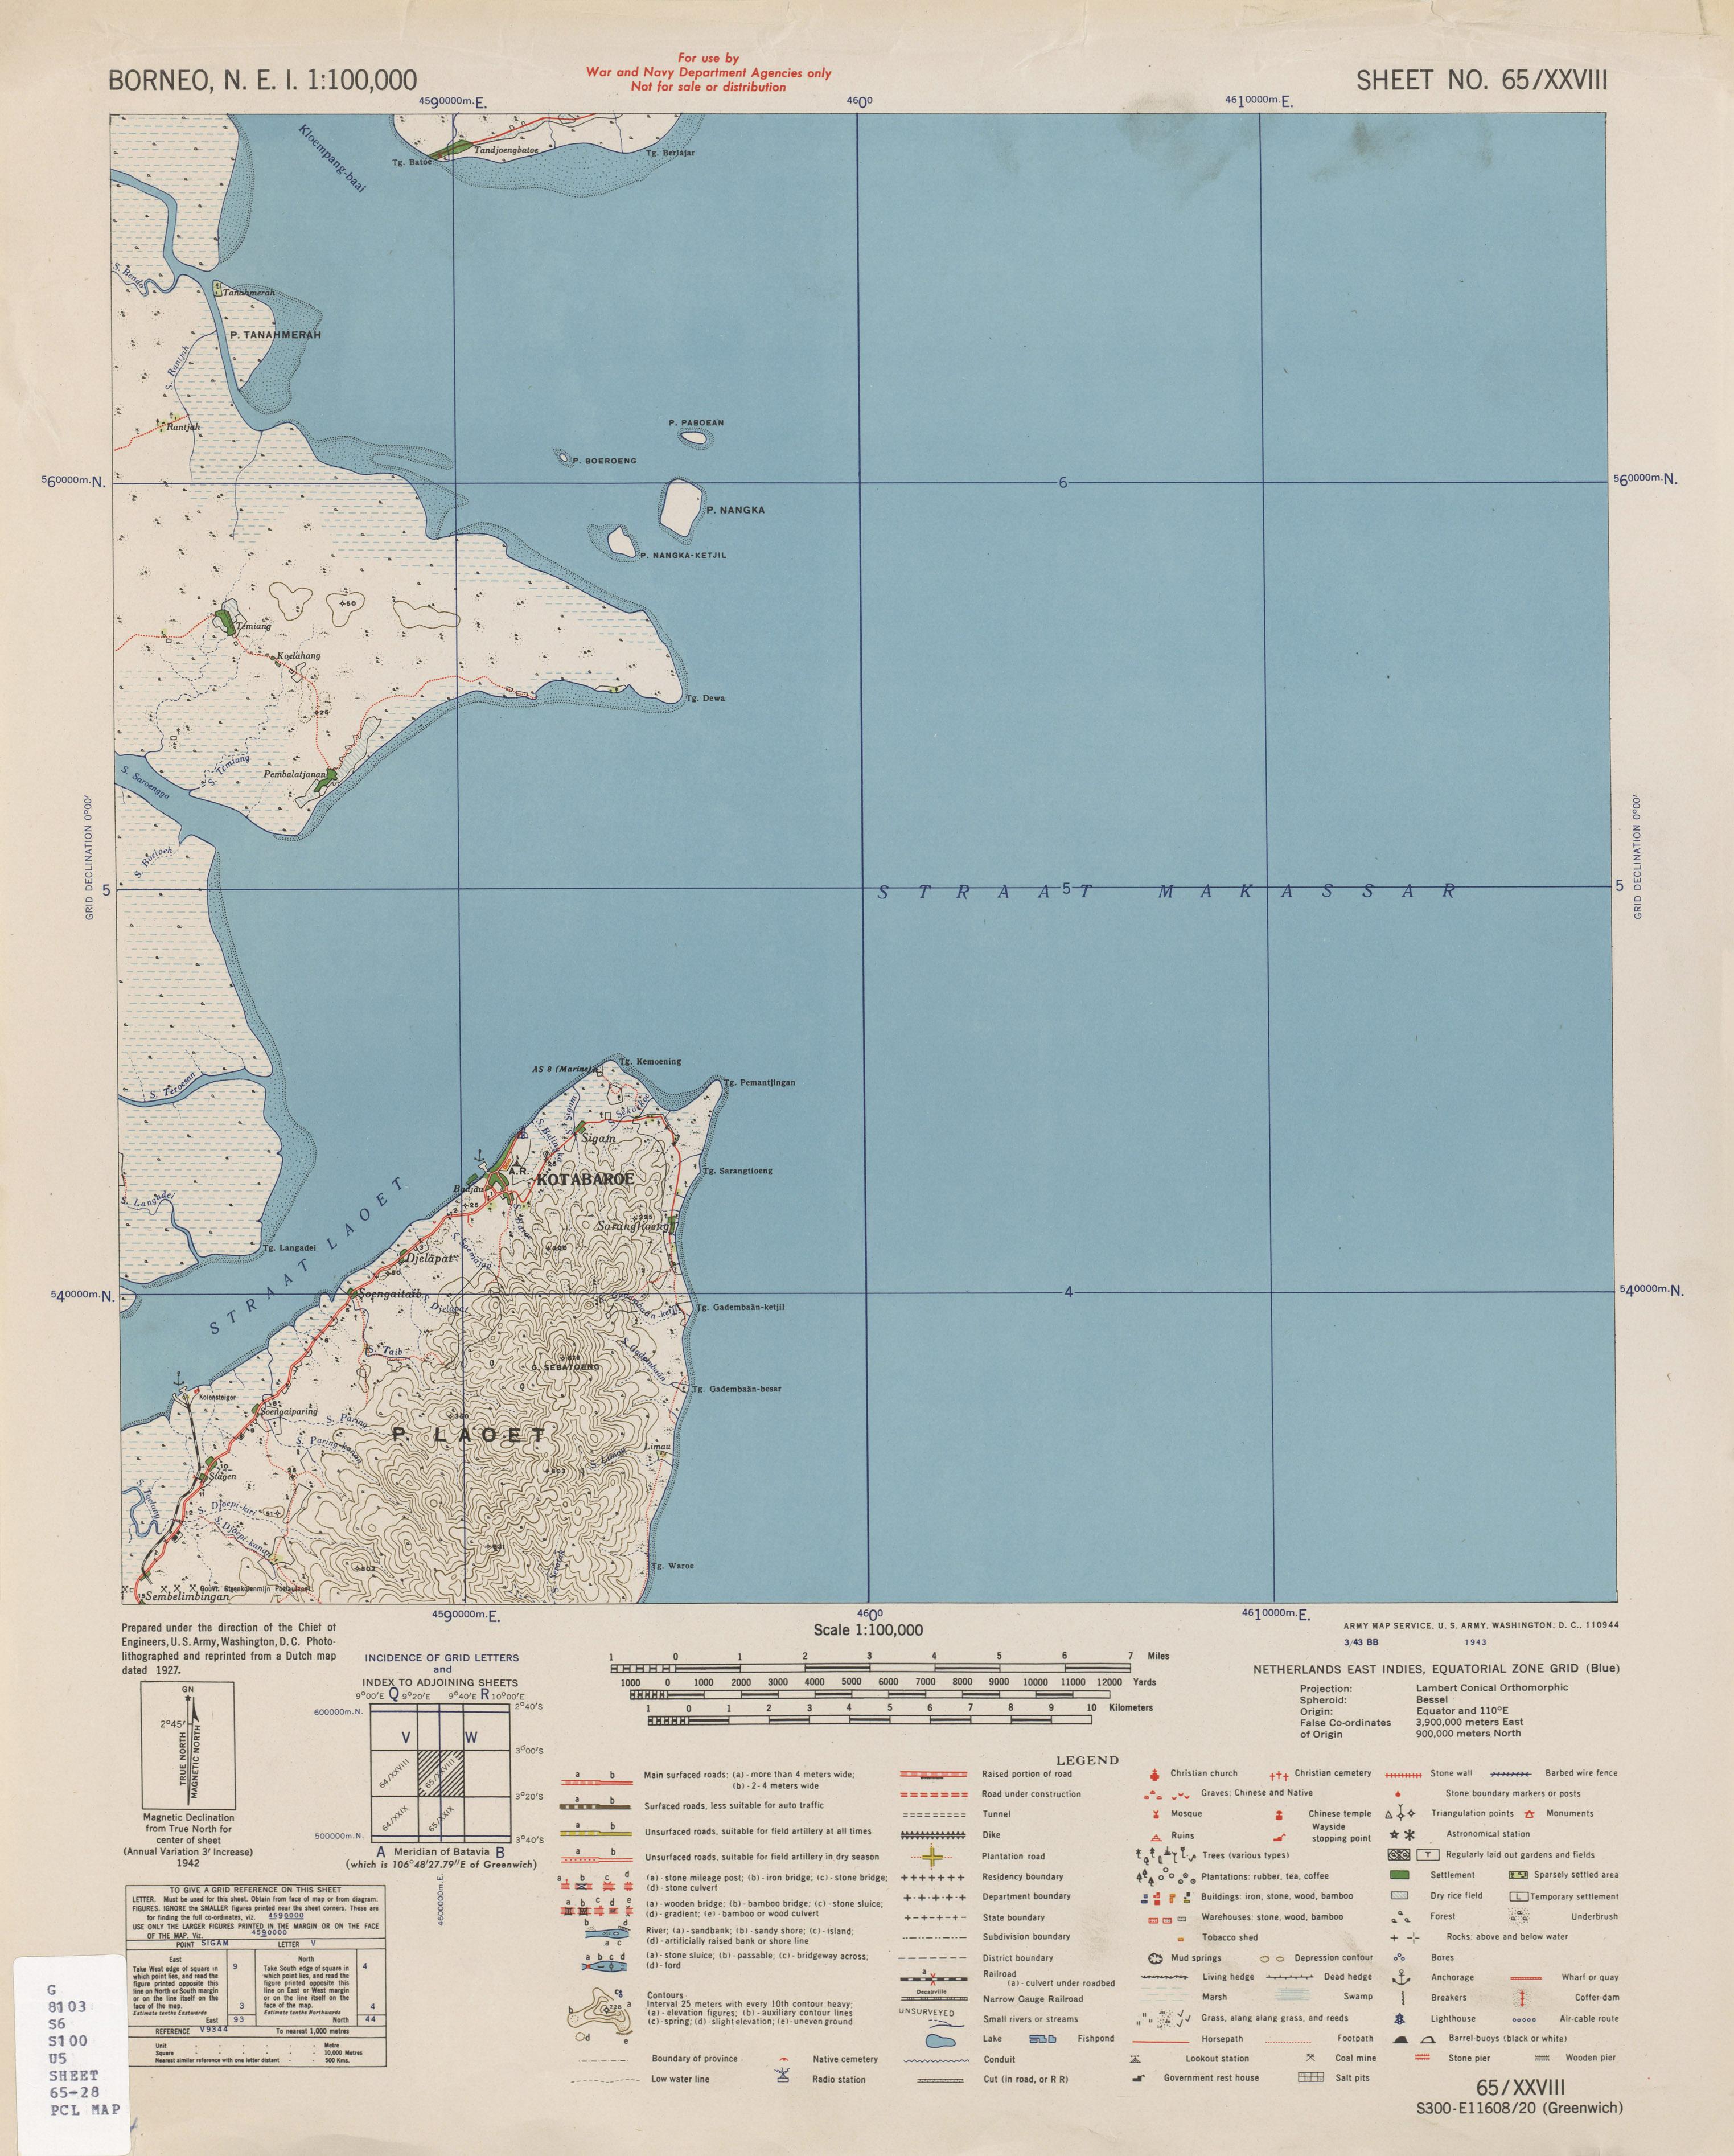 Southeast USA Map Southeast USA Wall Map Mapscom Map Of The Day - Map usa states cities mileage